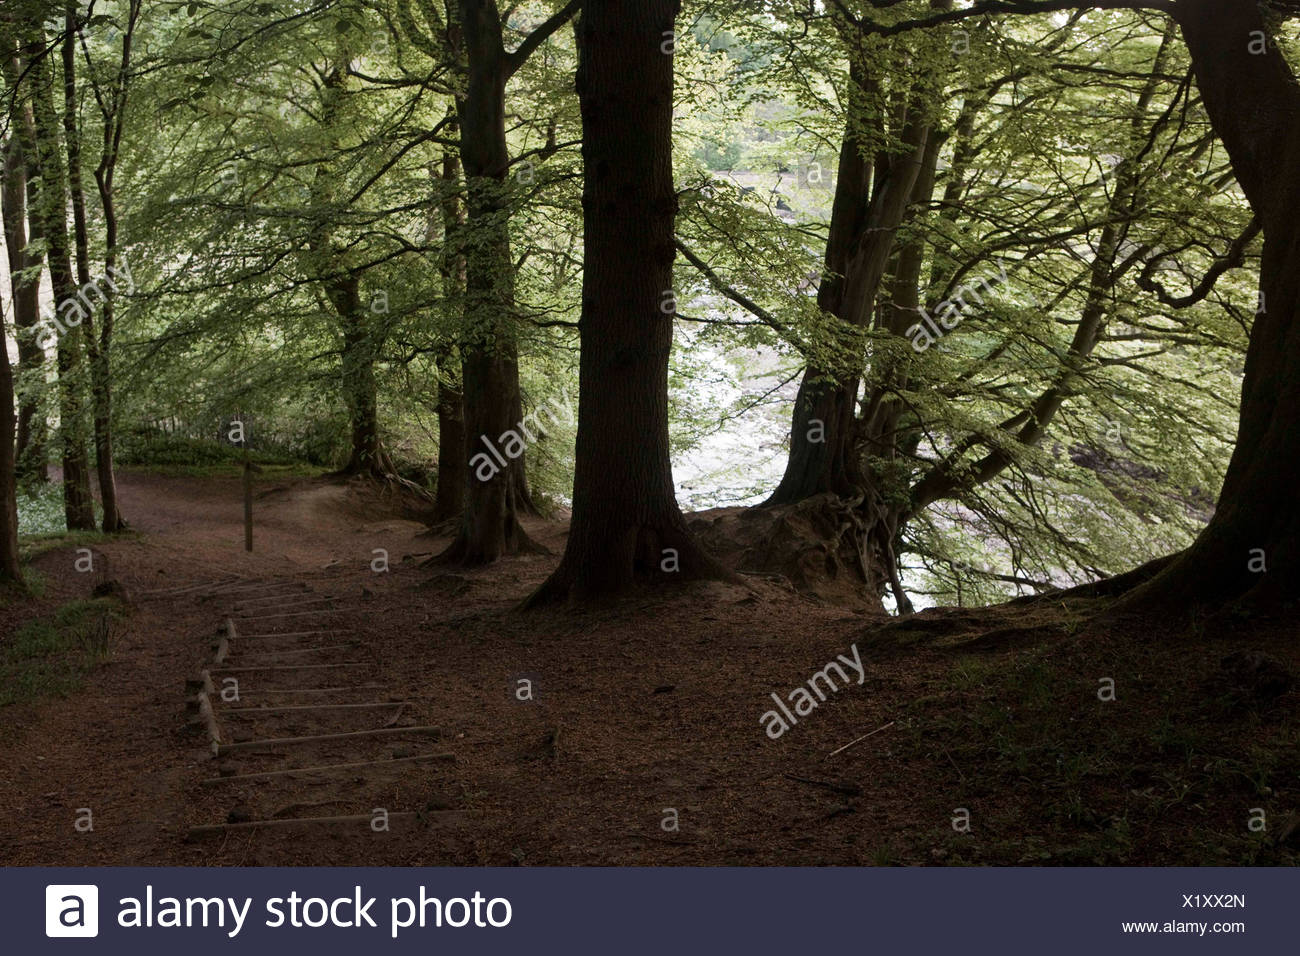 Escena del bosque Imagen De Stock